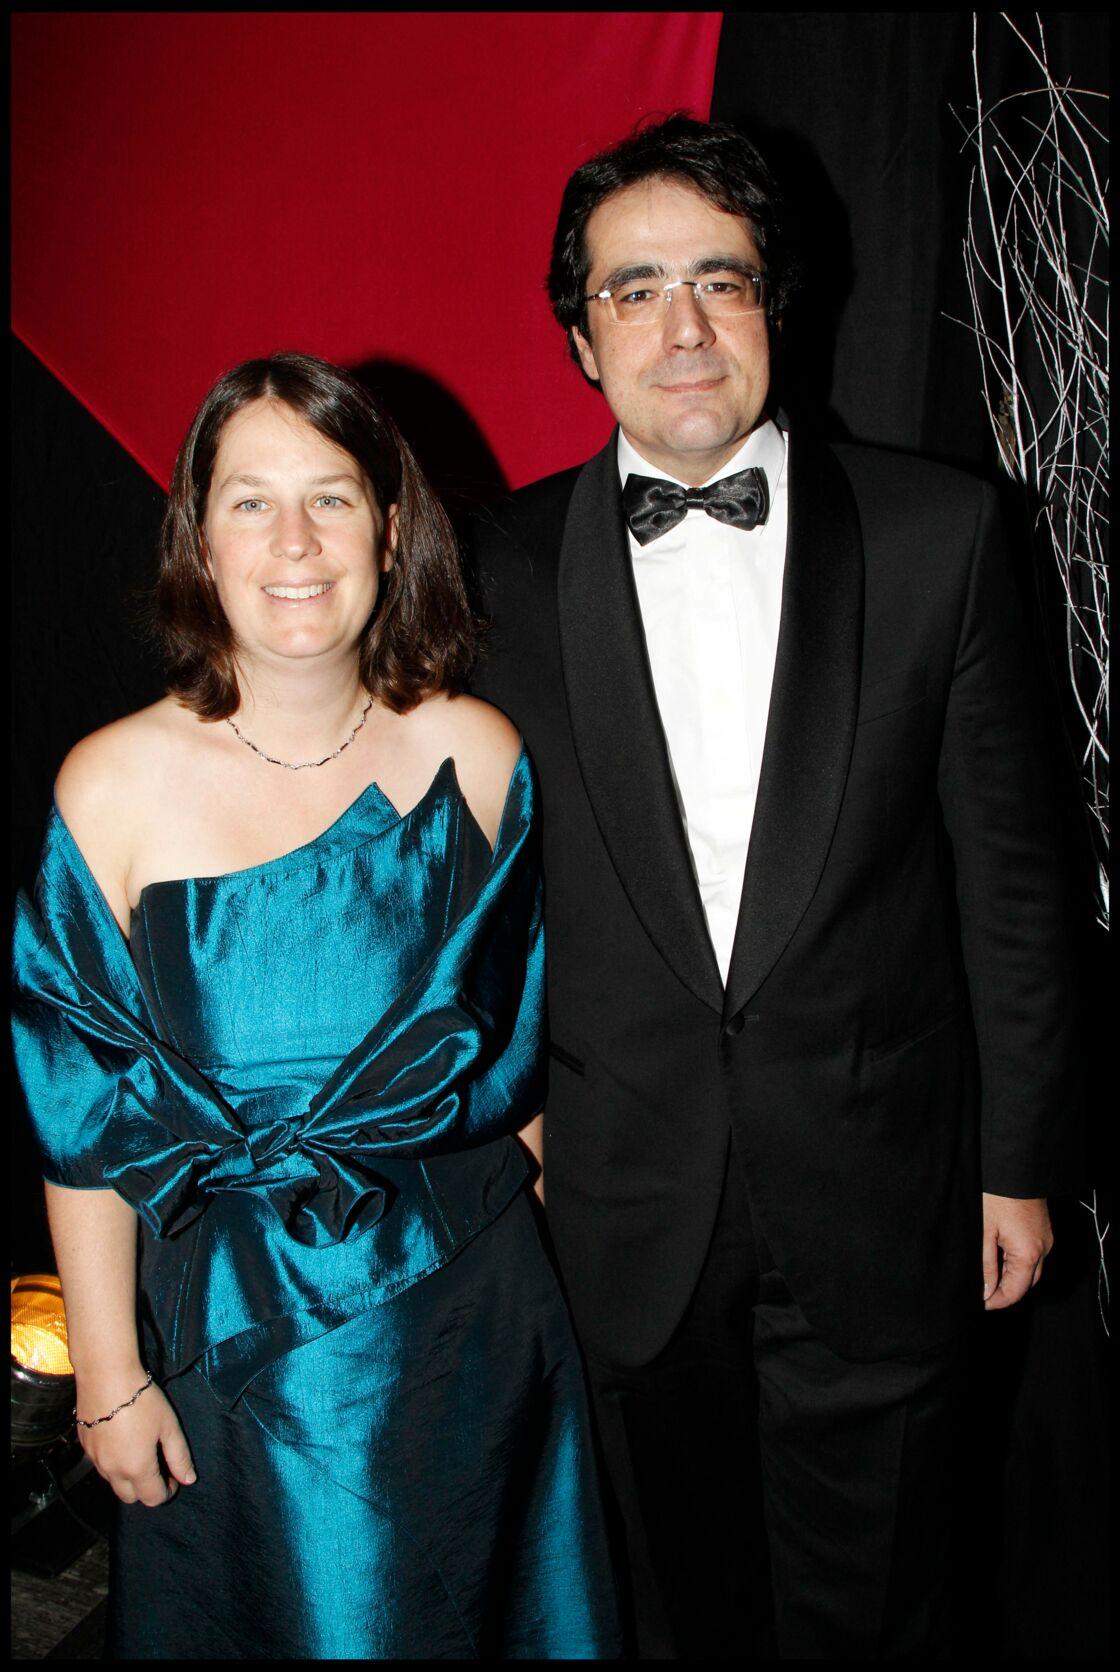 Darius Rochebin et sa femme Marie